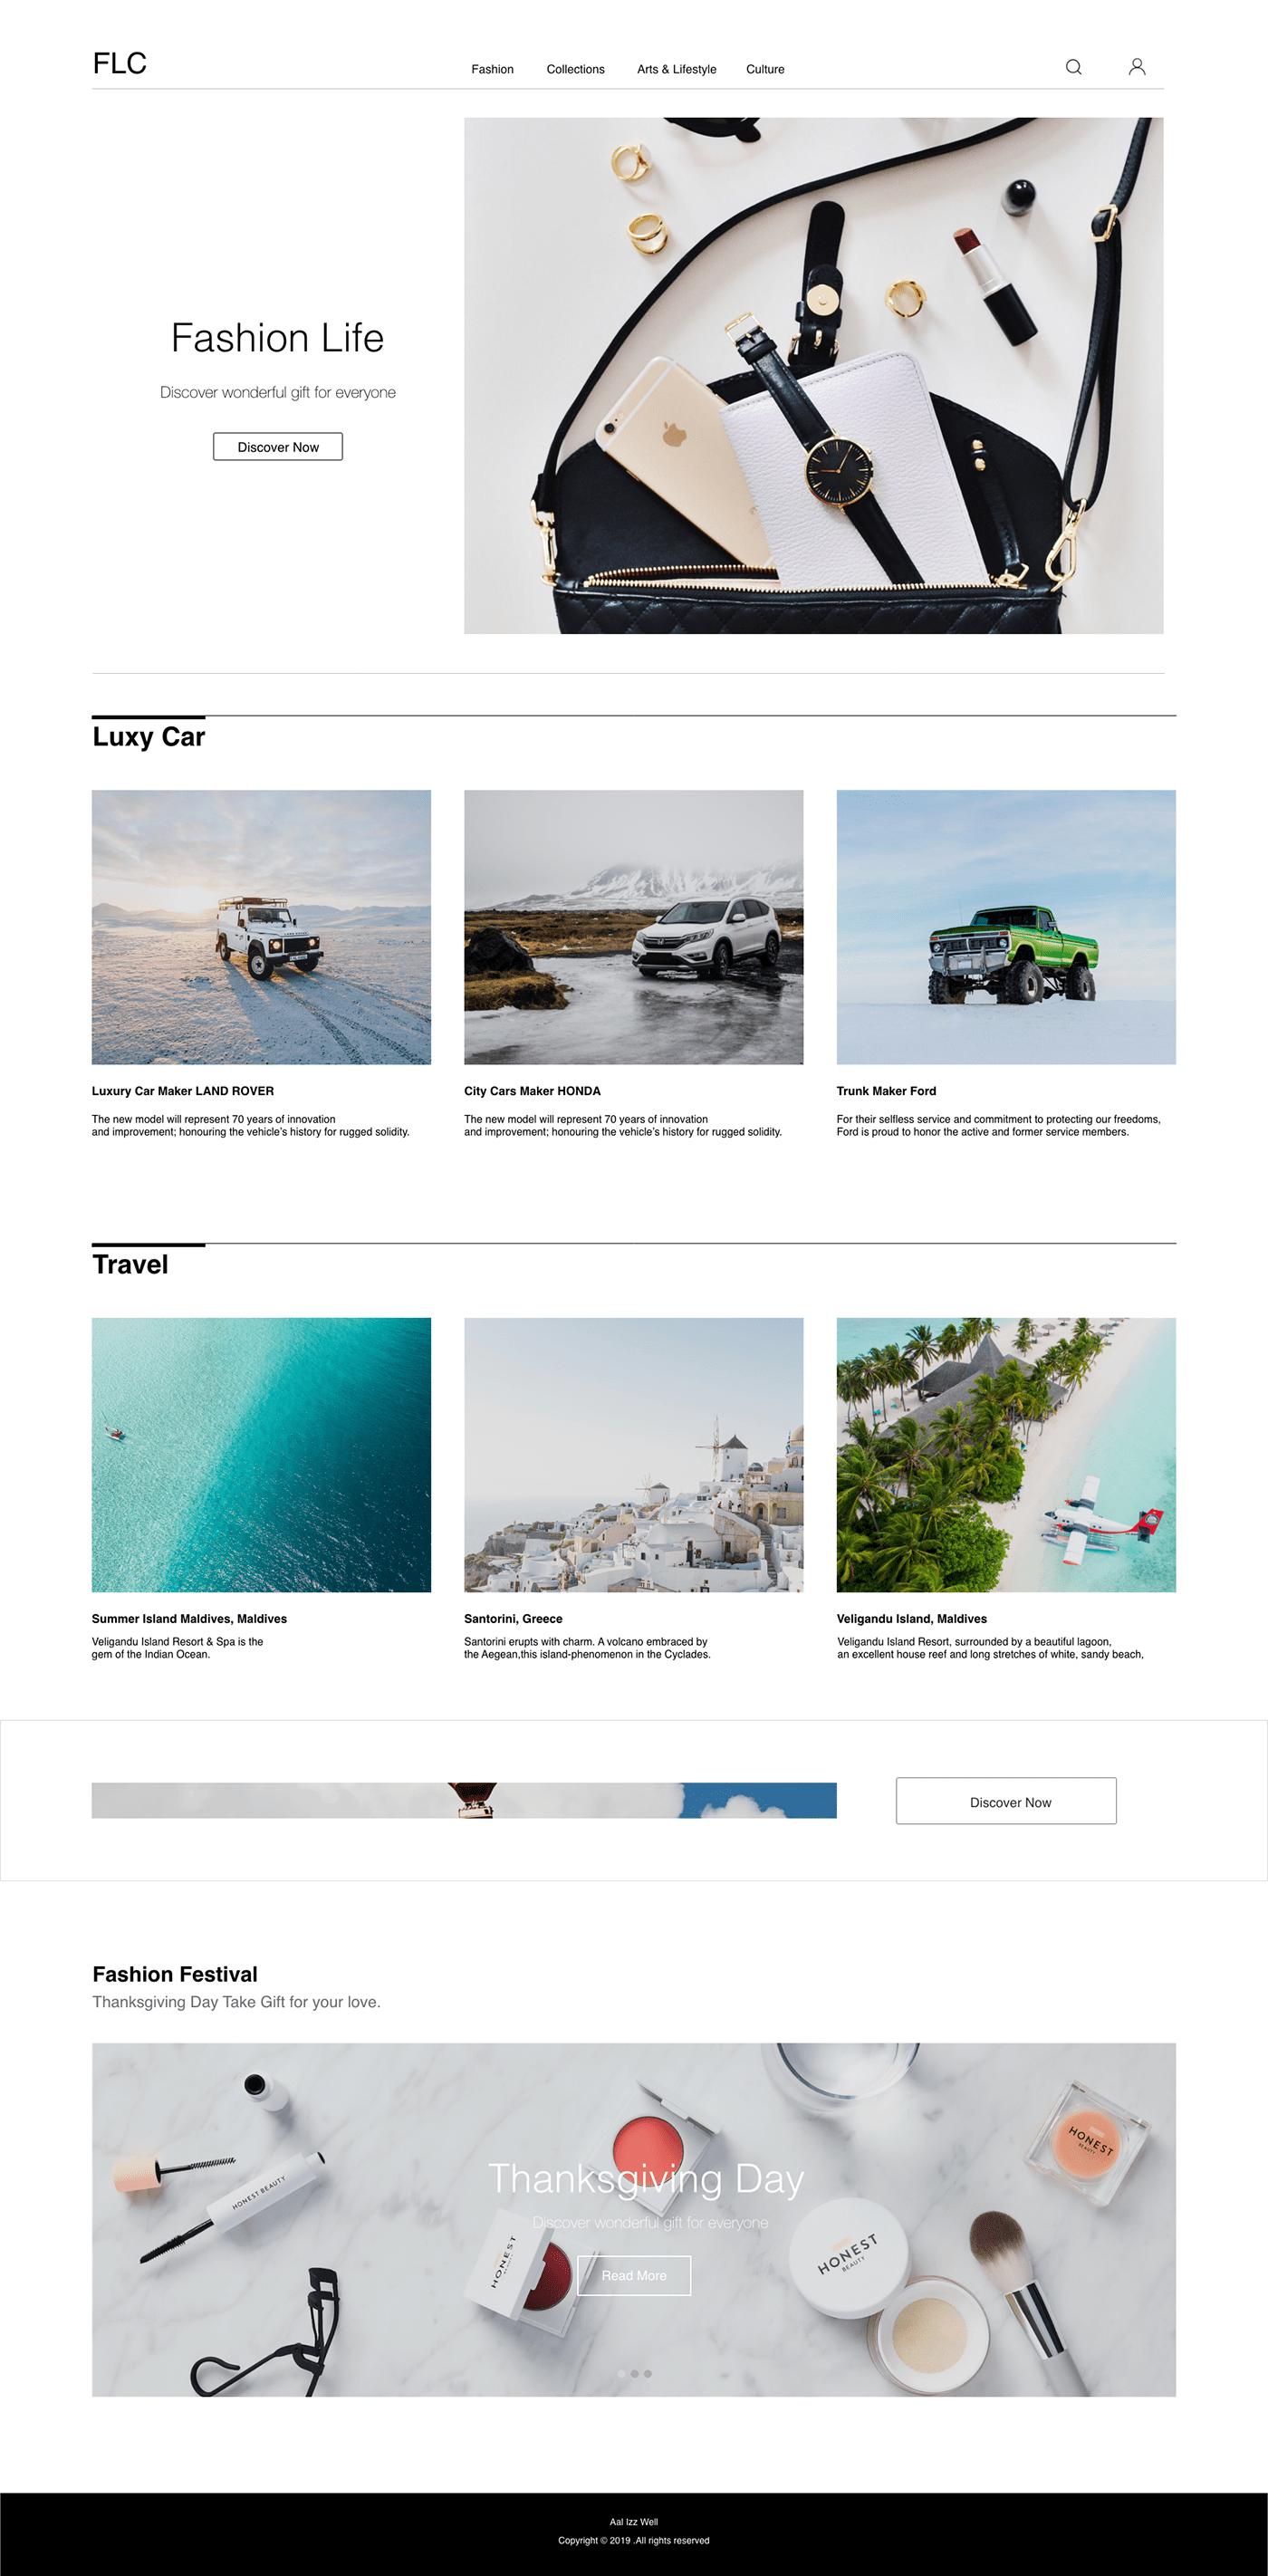 UI ux Web Design  Interaction design  brand visual design visual arts  Brand Design Web Fashion